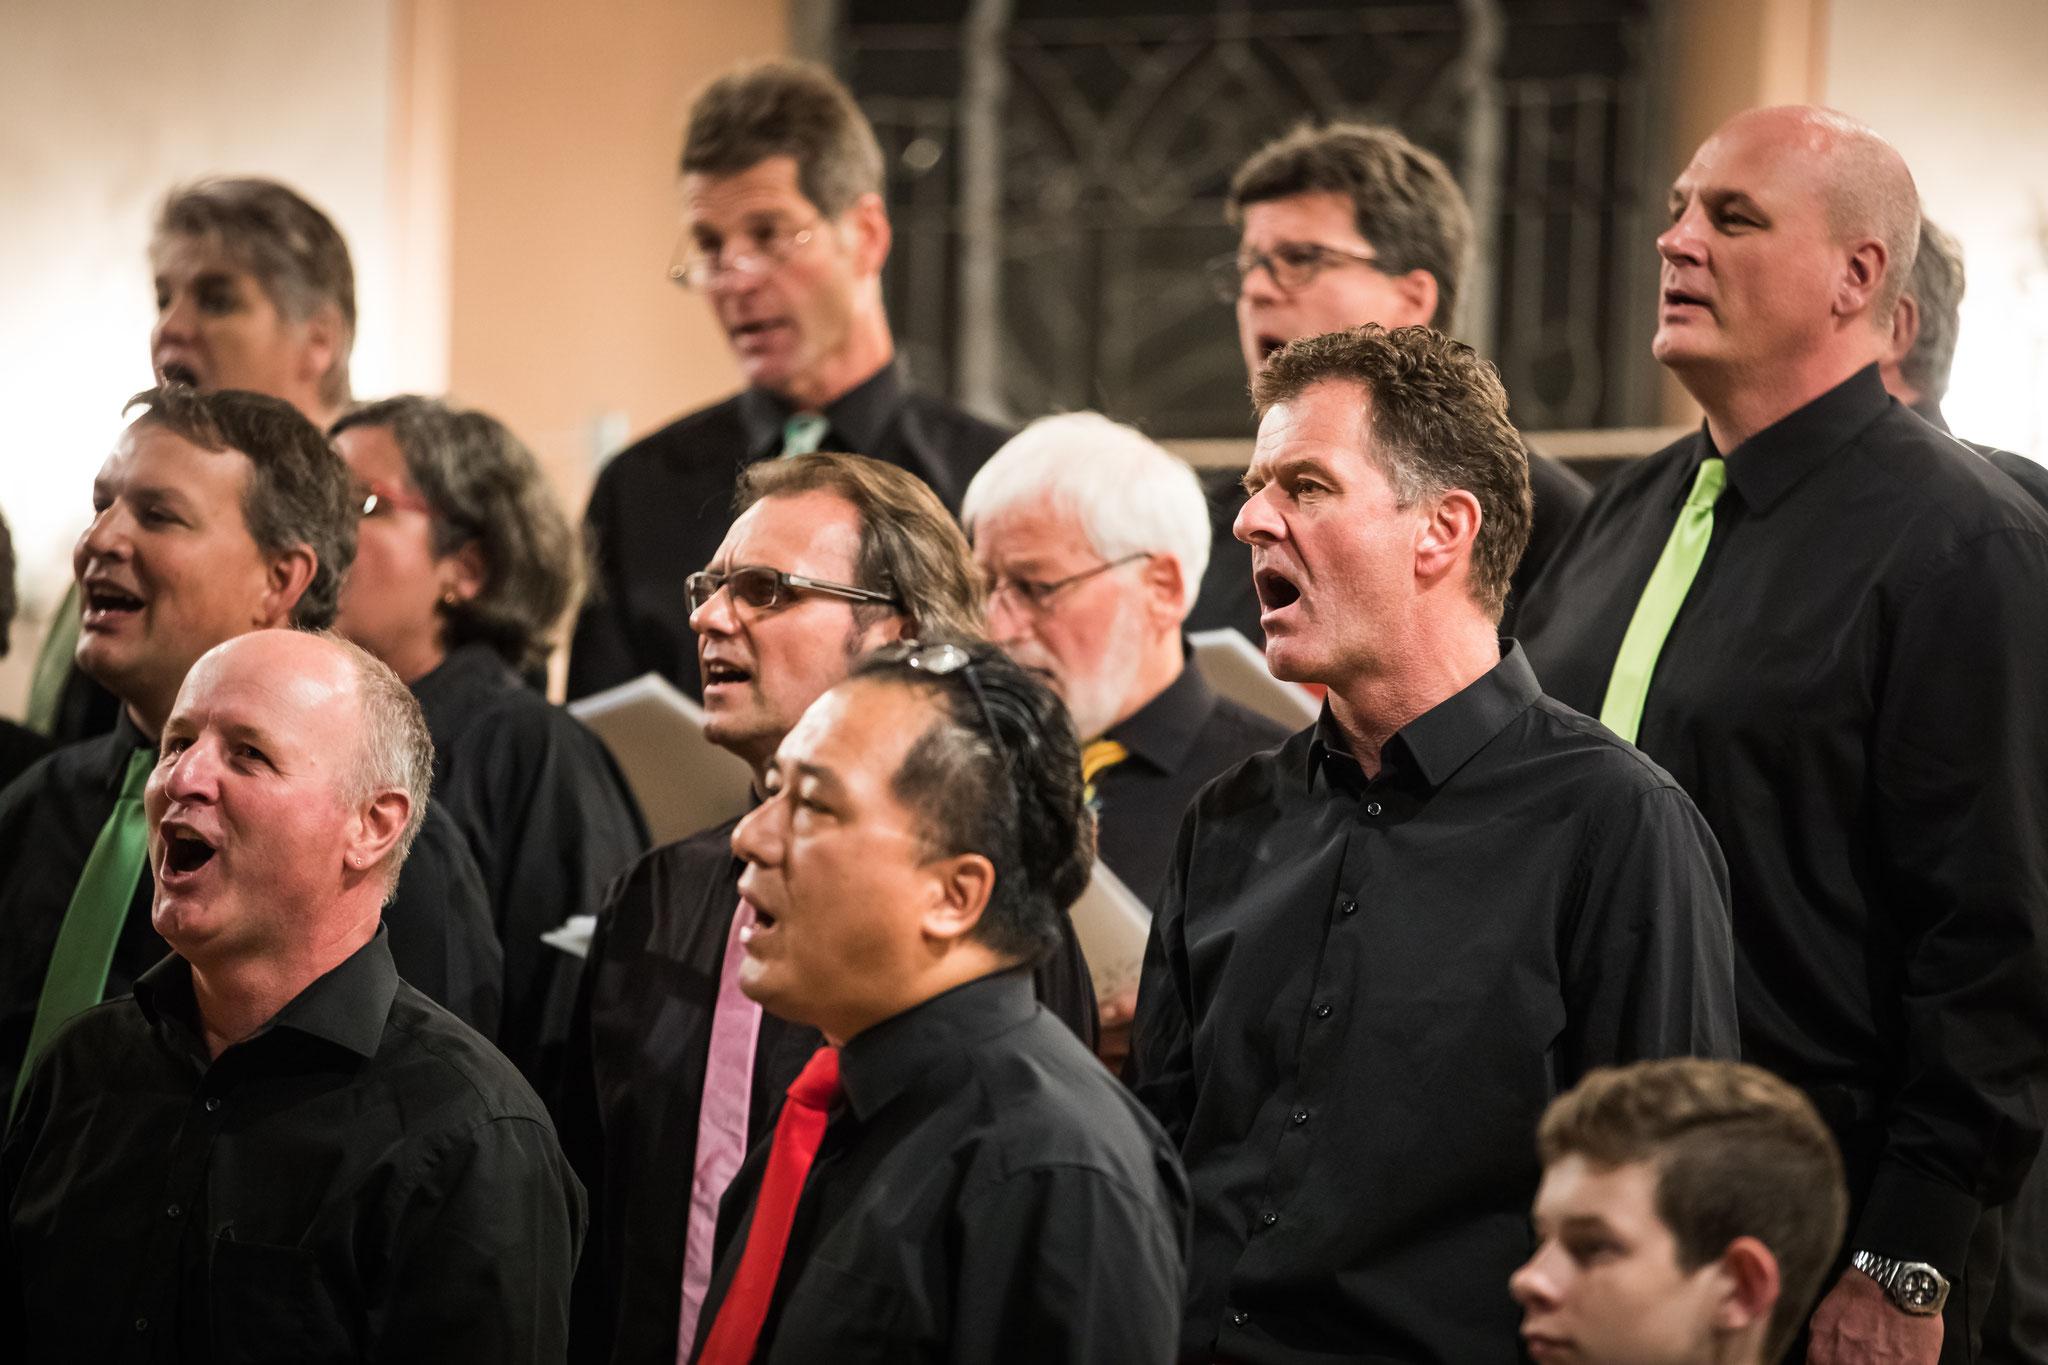 Winterkonzert 2018 - Kirche Rapperswil, 9.11.2018